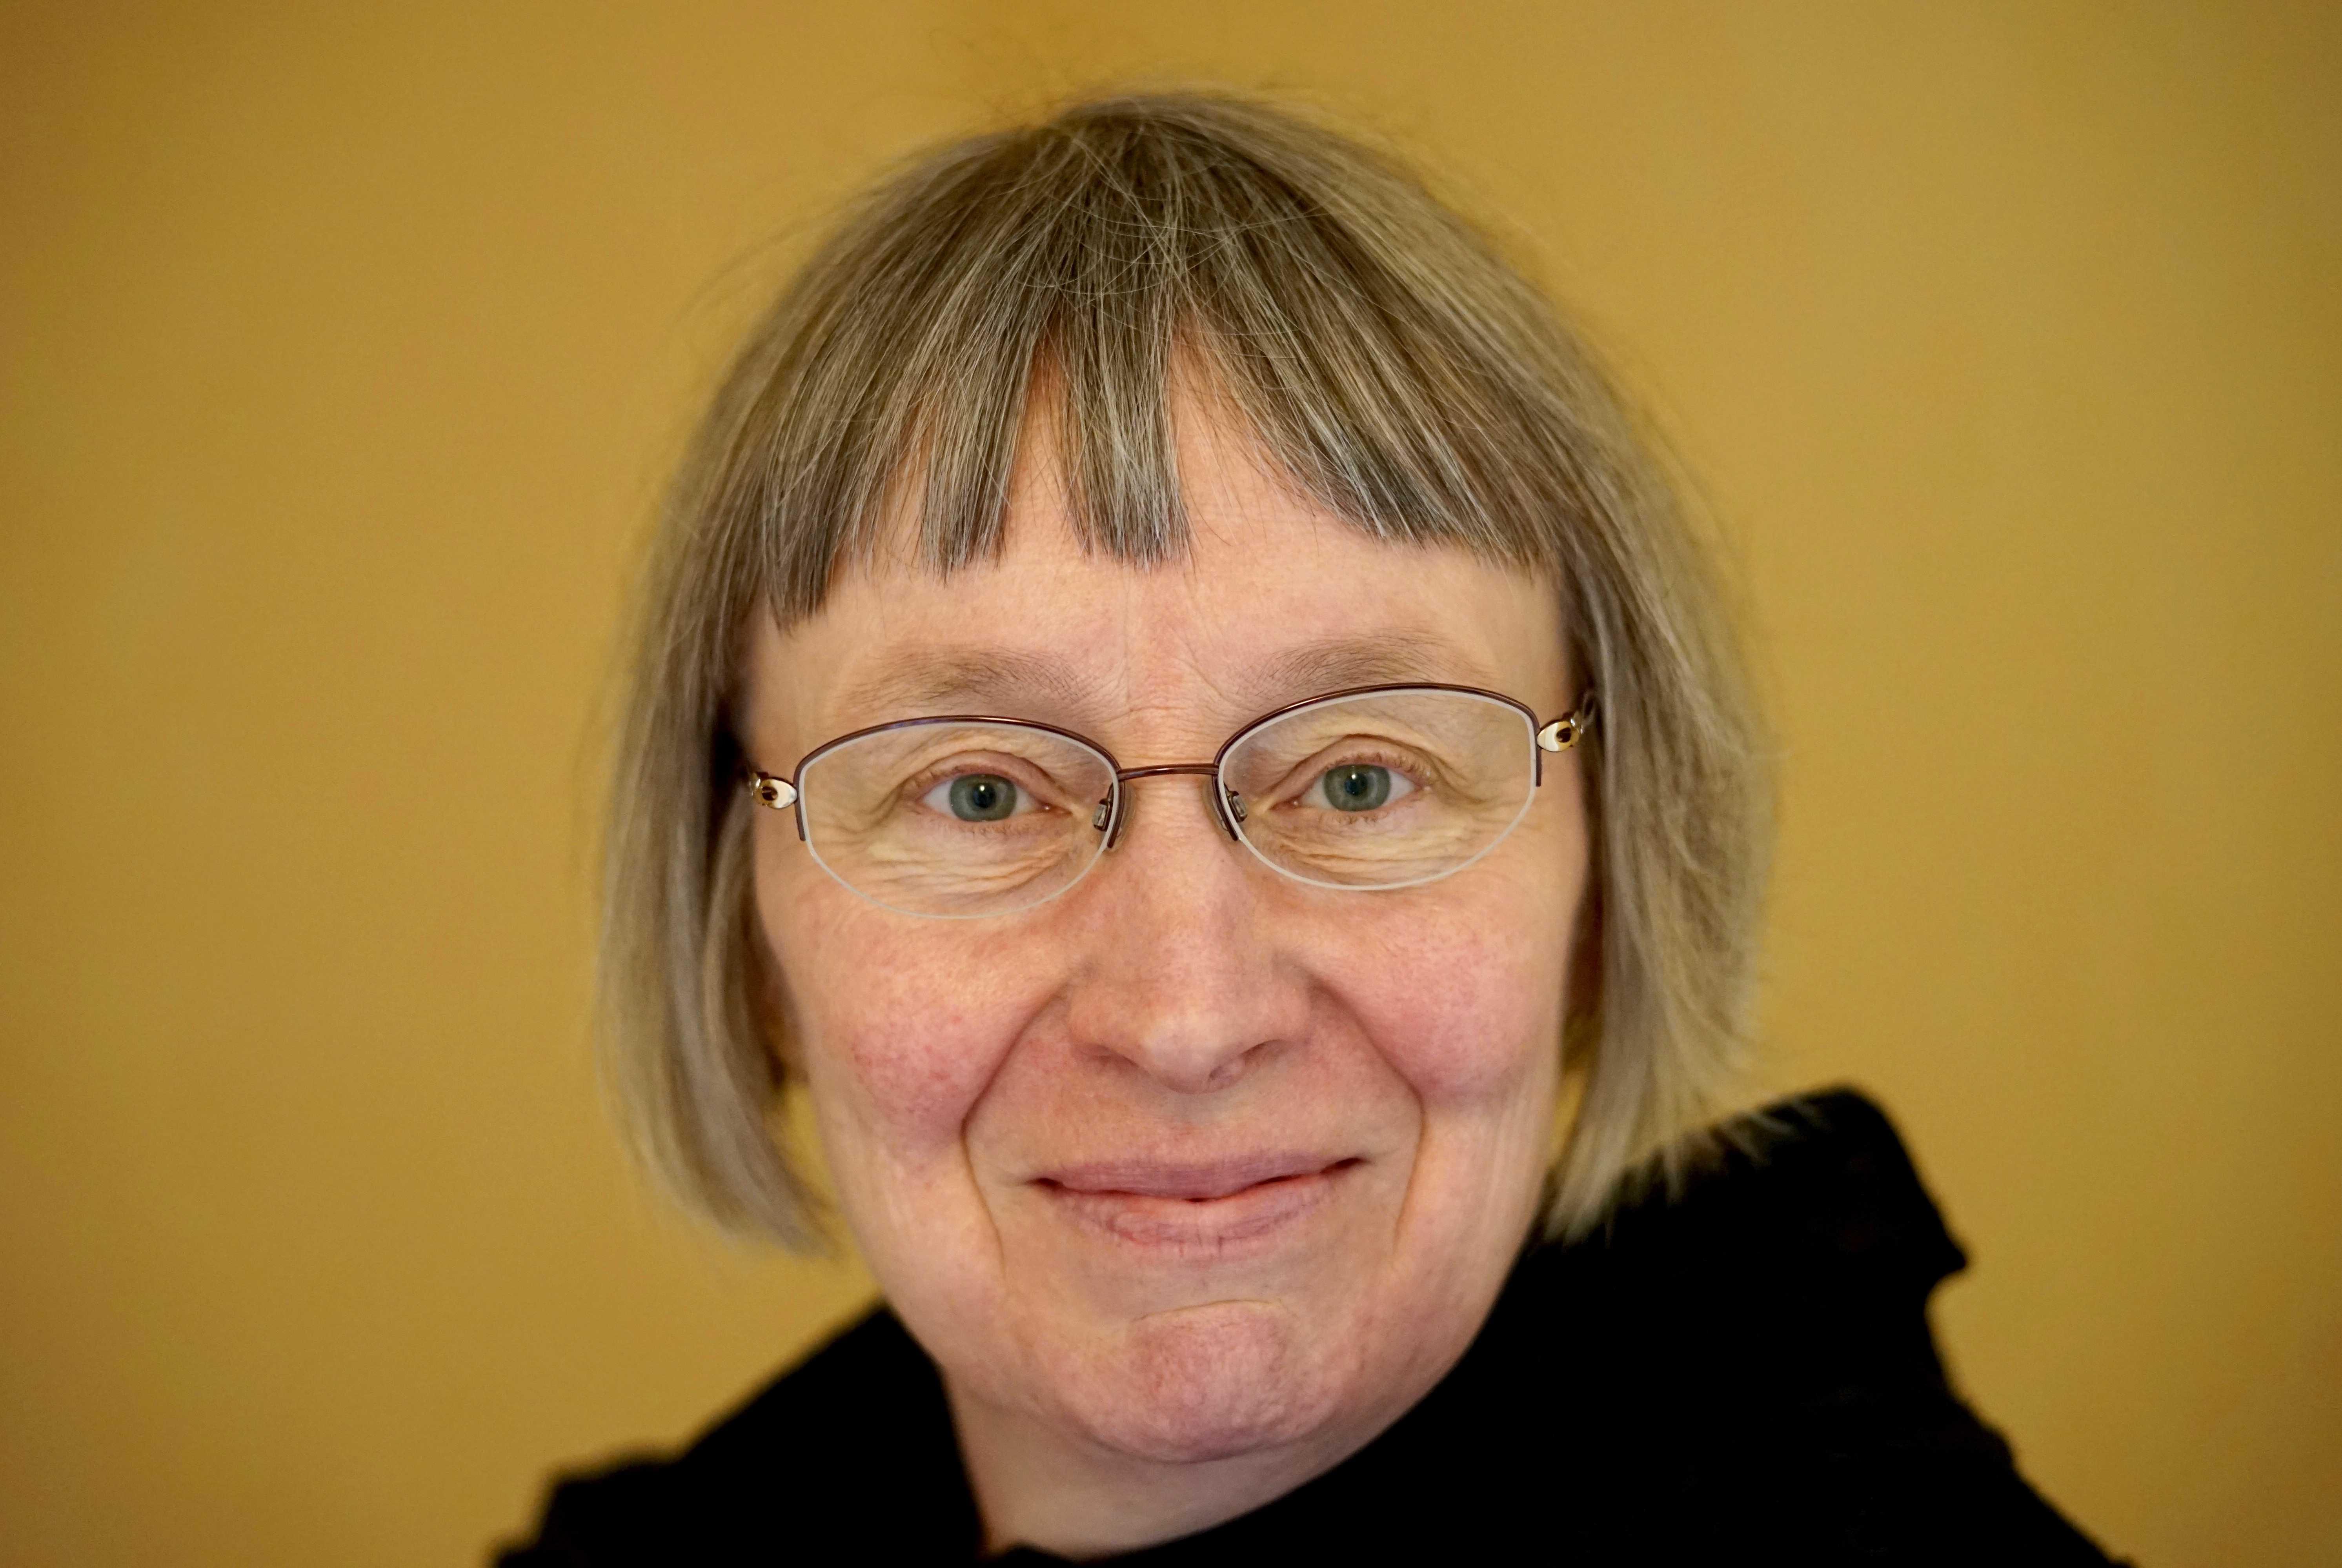 Kerstin Johansson